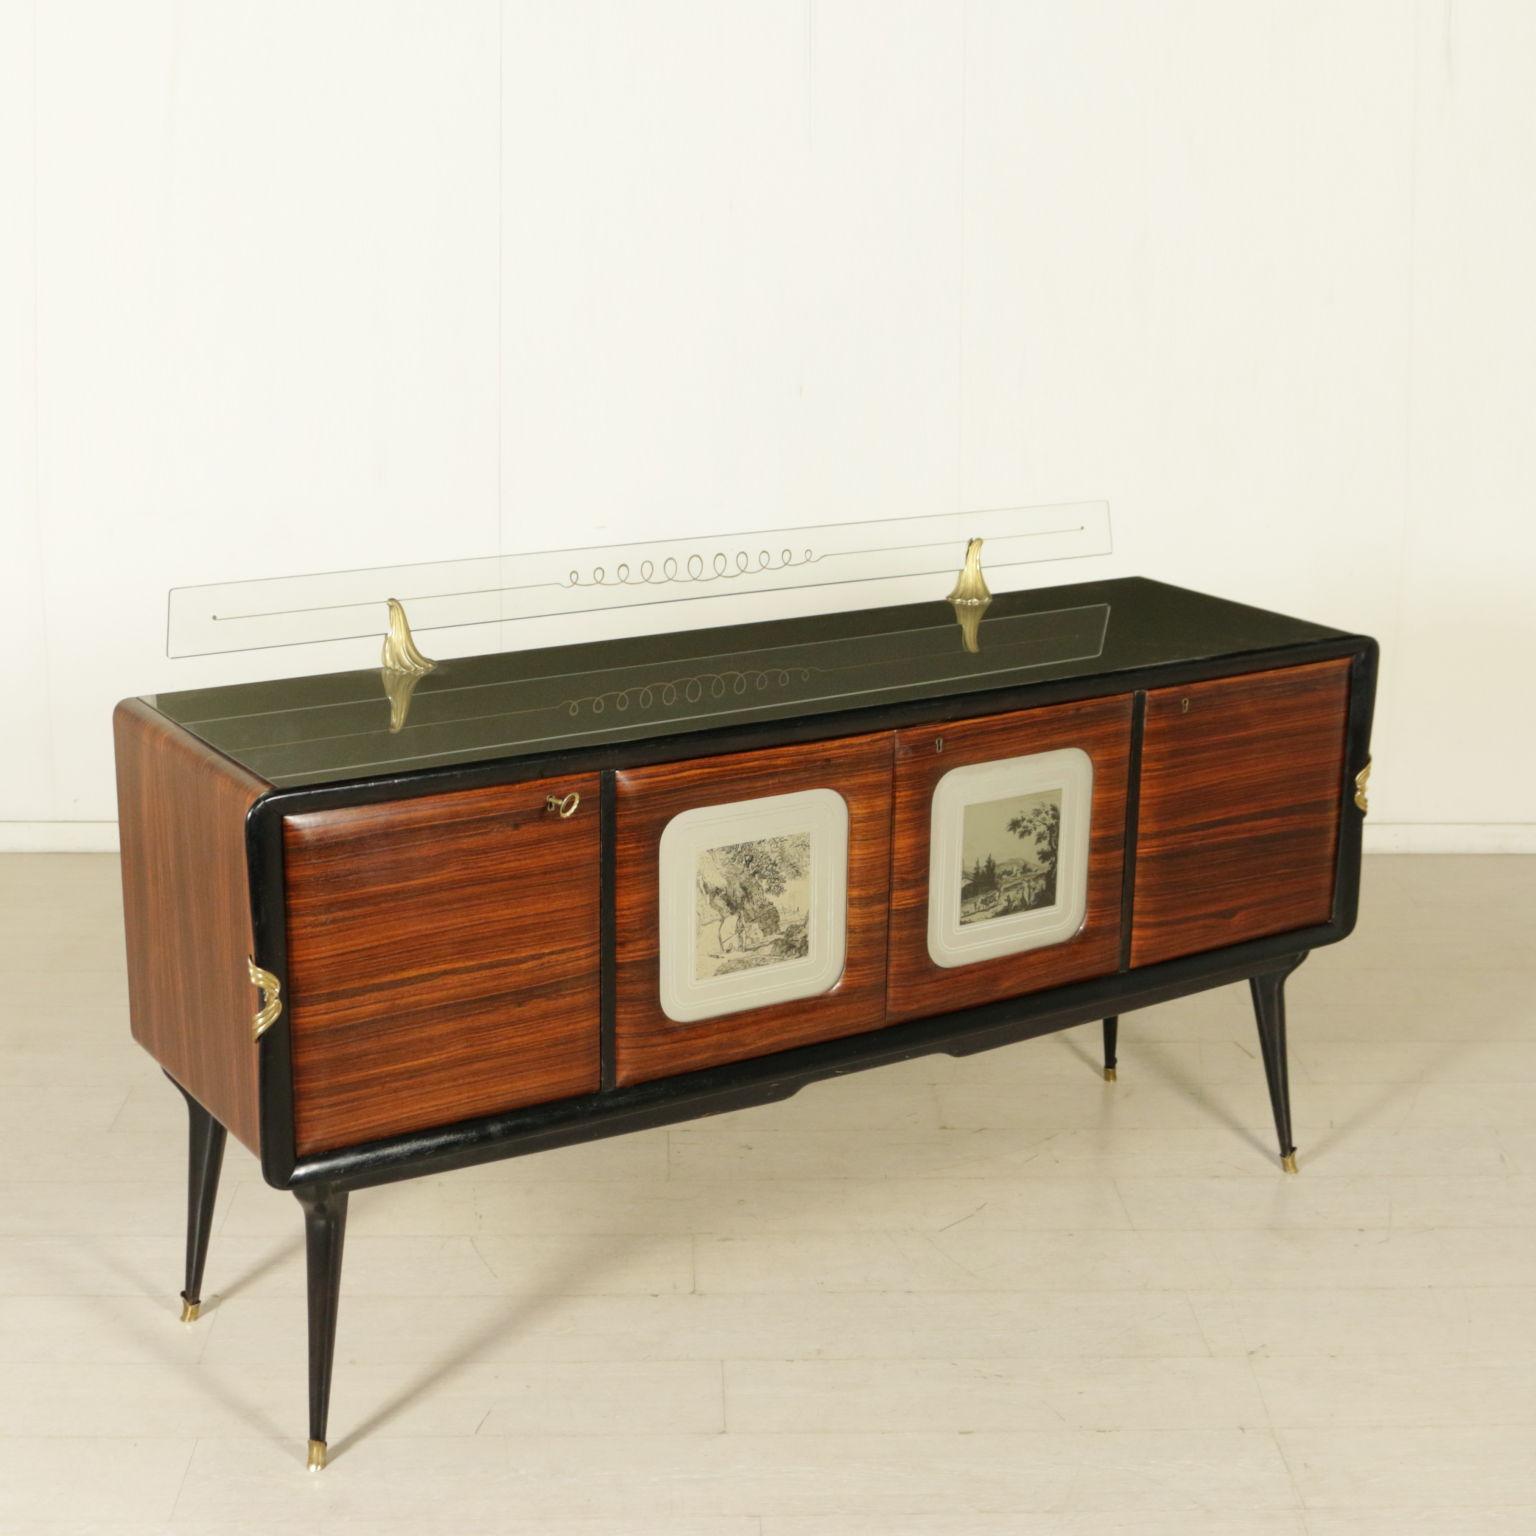 Meuble Buffet Année 50 meuble buffet années 50 vintage italie - meubles - moderne